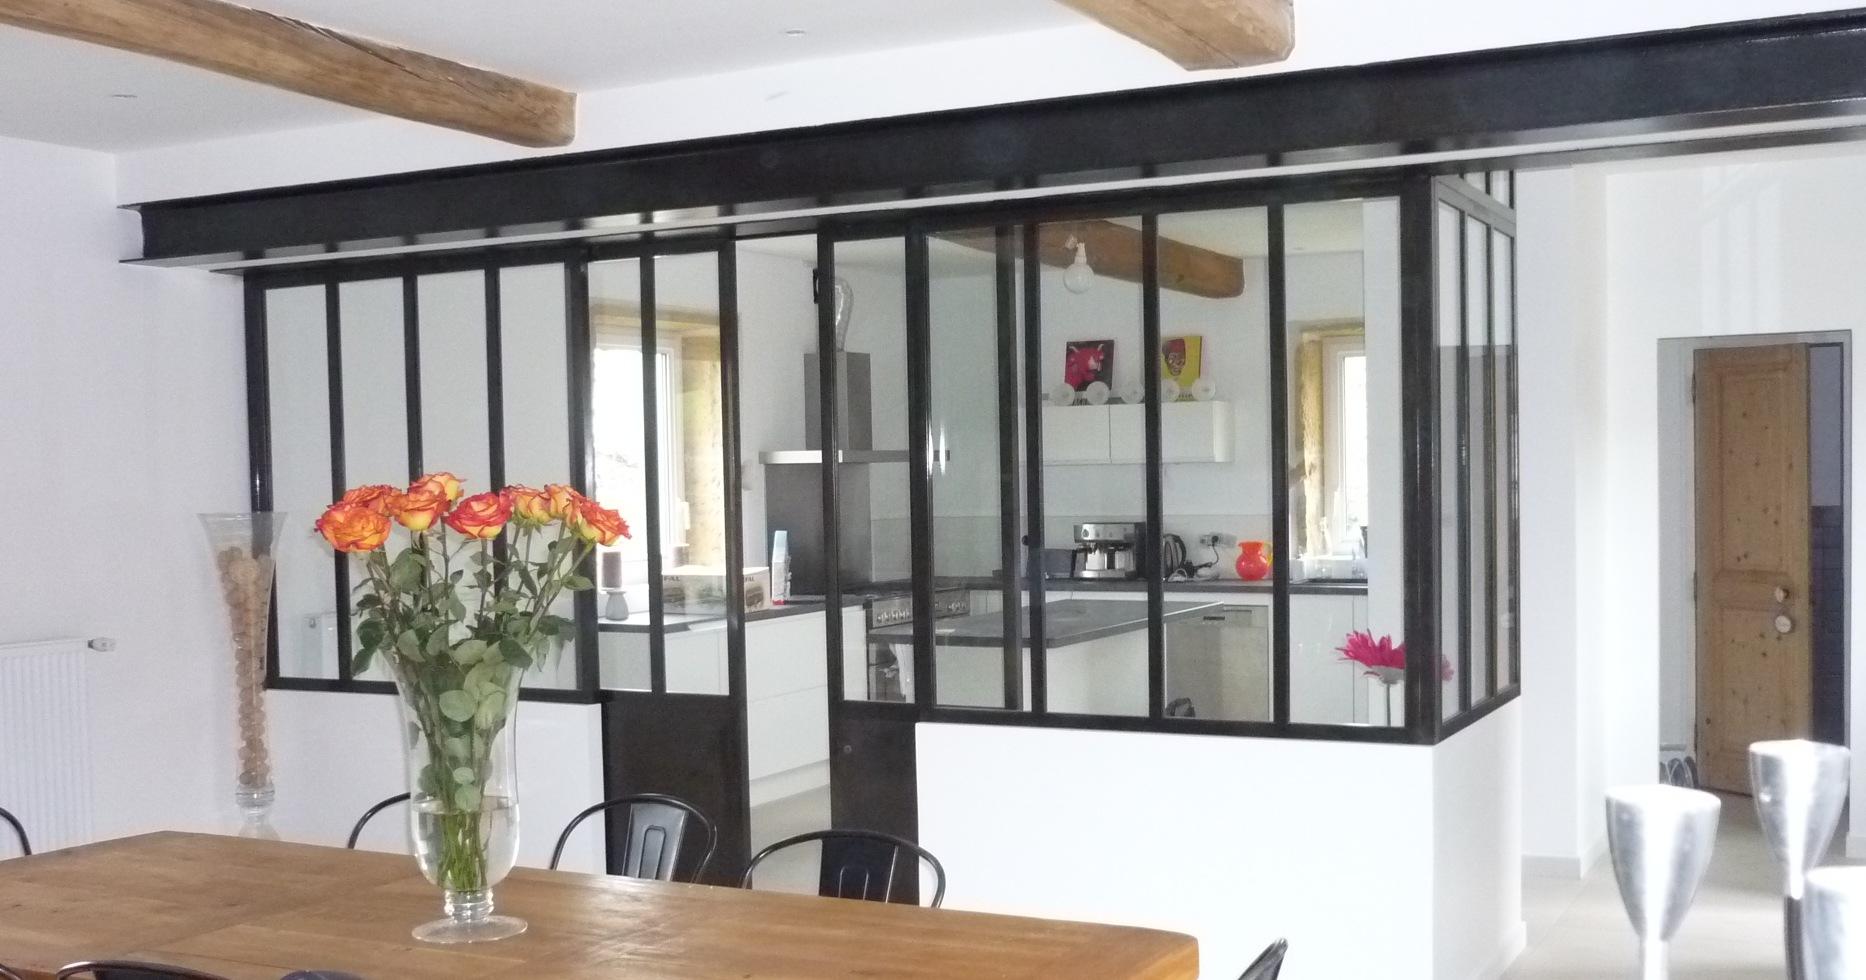 verri re atelier d 39 artiste r gion lyonnaise. Black Bedroom Furniture Sets. Home Design Ideas